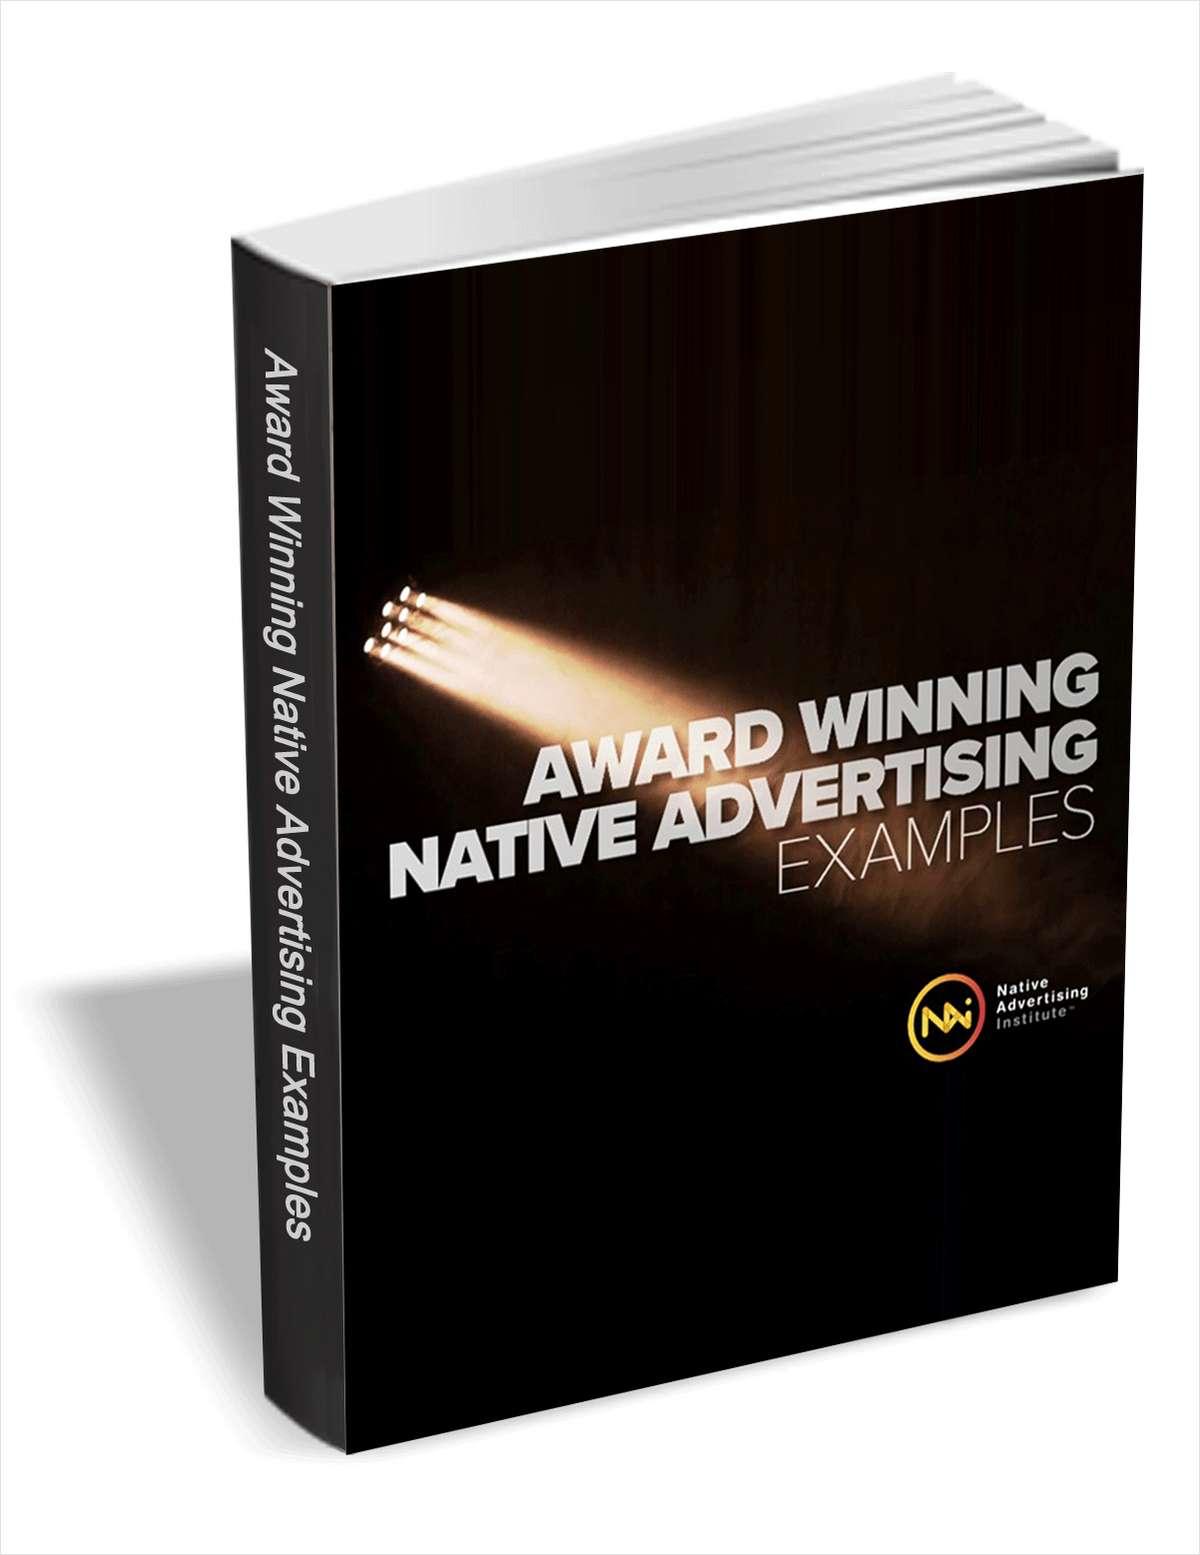 Award Winning Native Advertising Examples - Be Inspired by the Best Native Advertising in the Industry